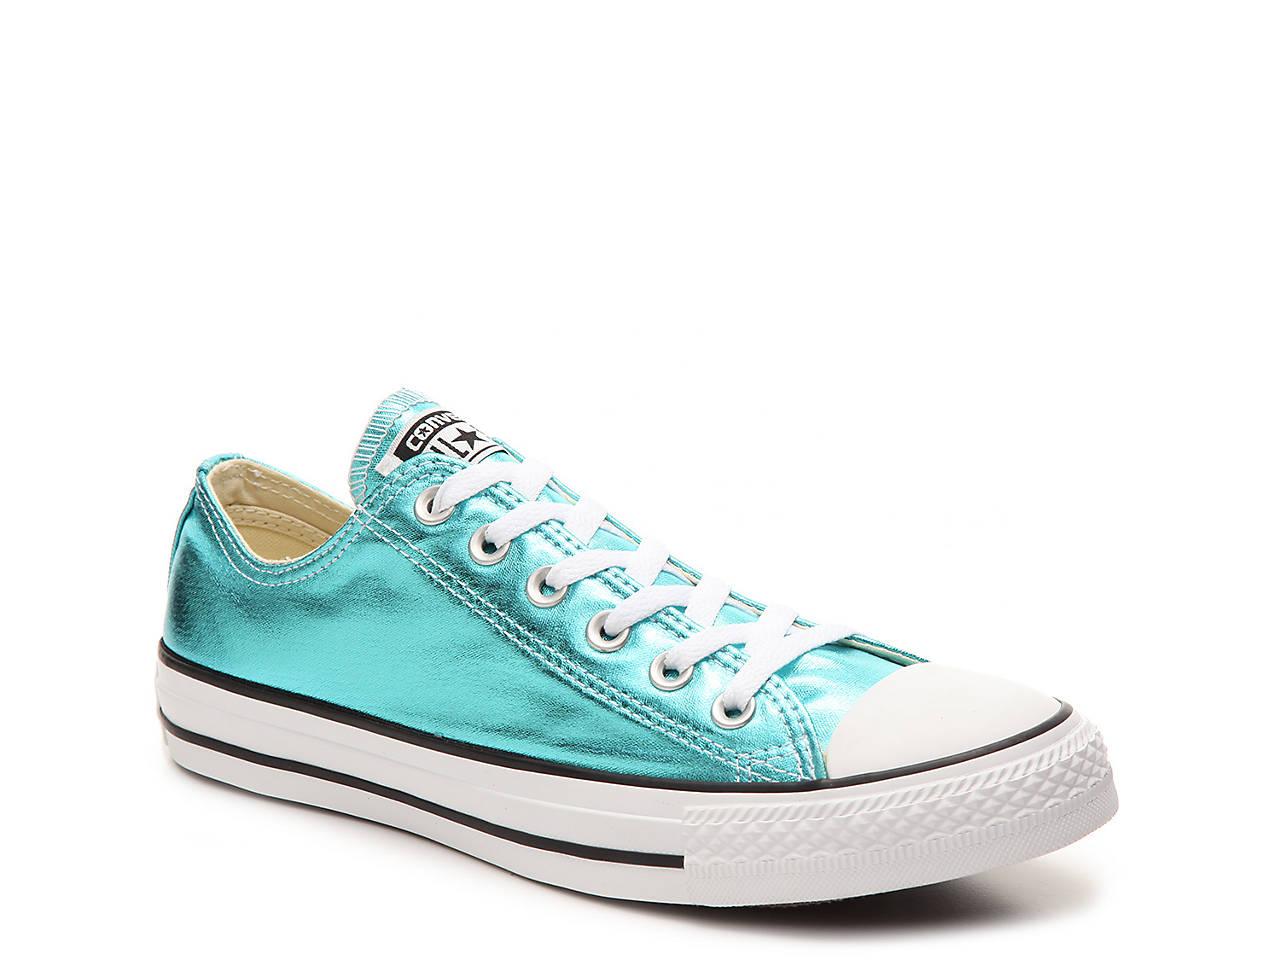 b9a4da8d5c82 Converse Chuck Taylor All Star Metallic Sneaker - Men s Men s Shoes ...